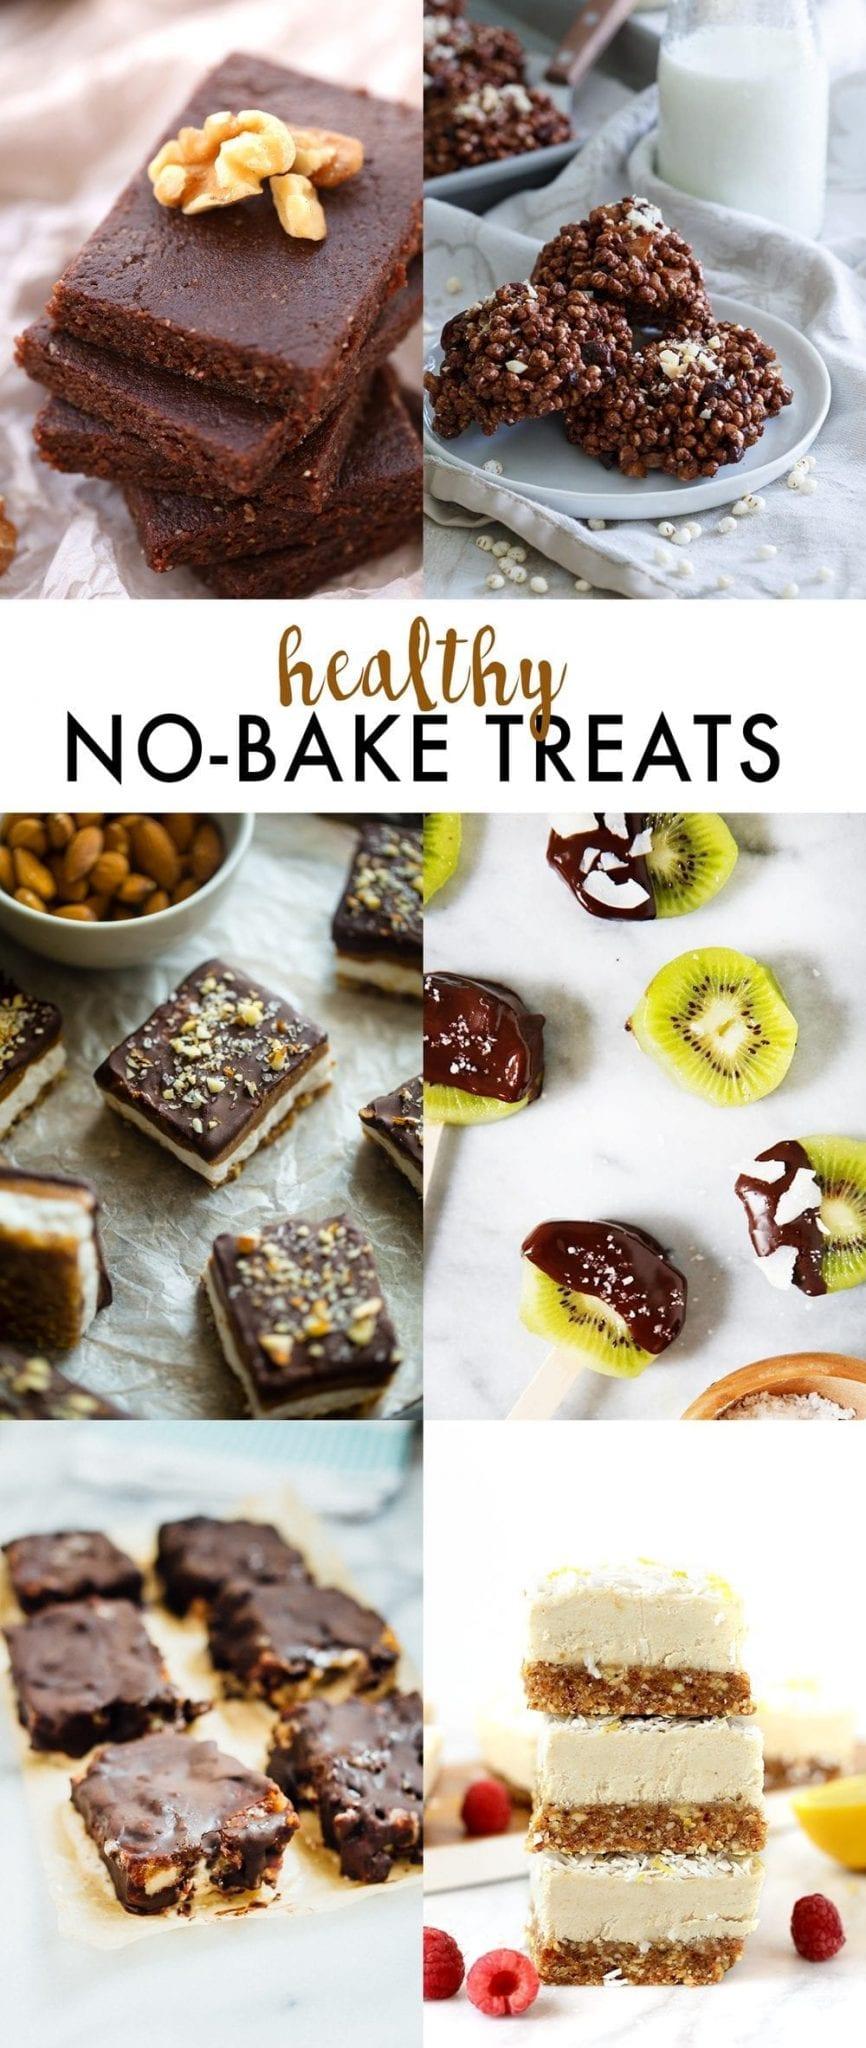 HealthyNoBakeTreats